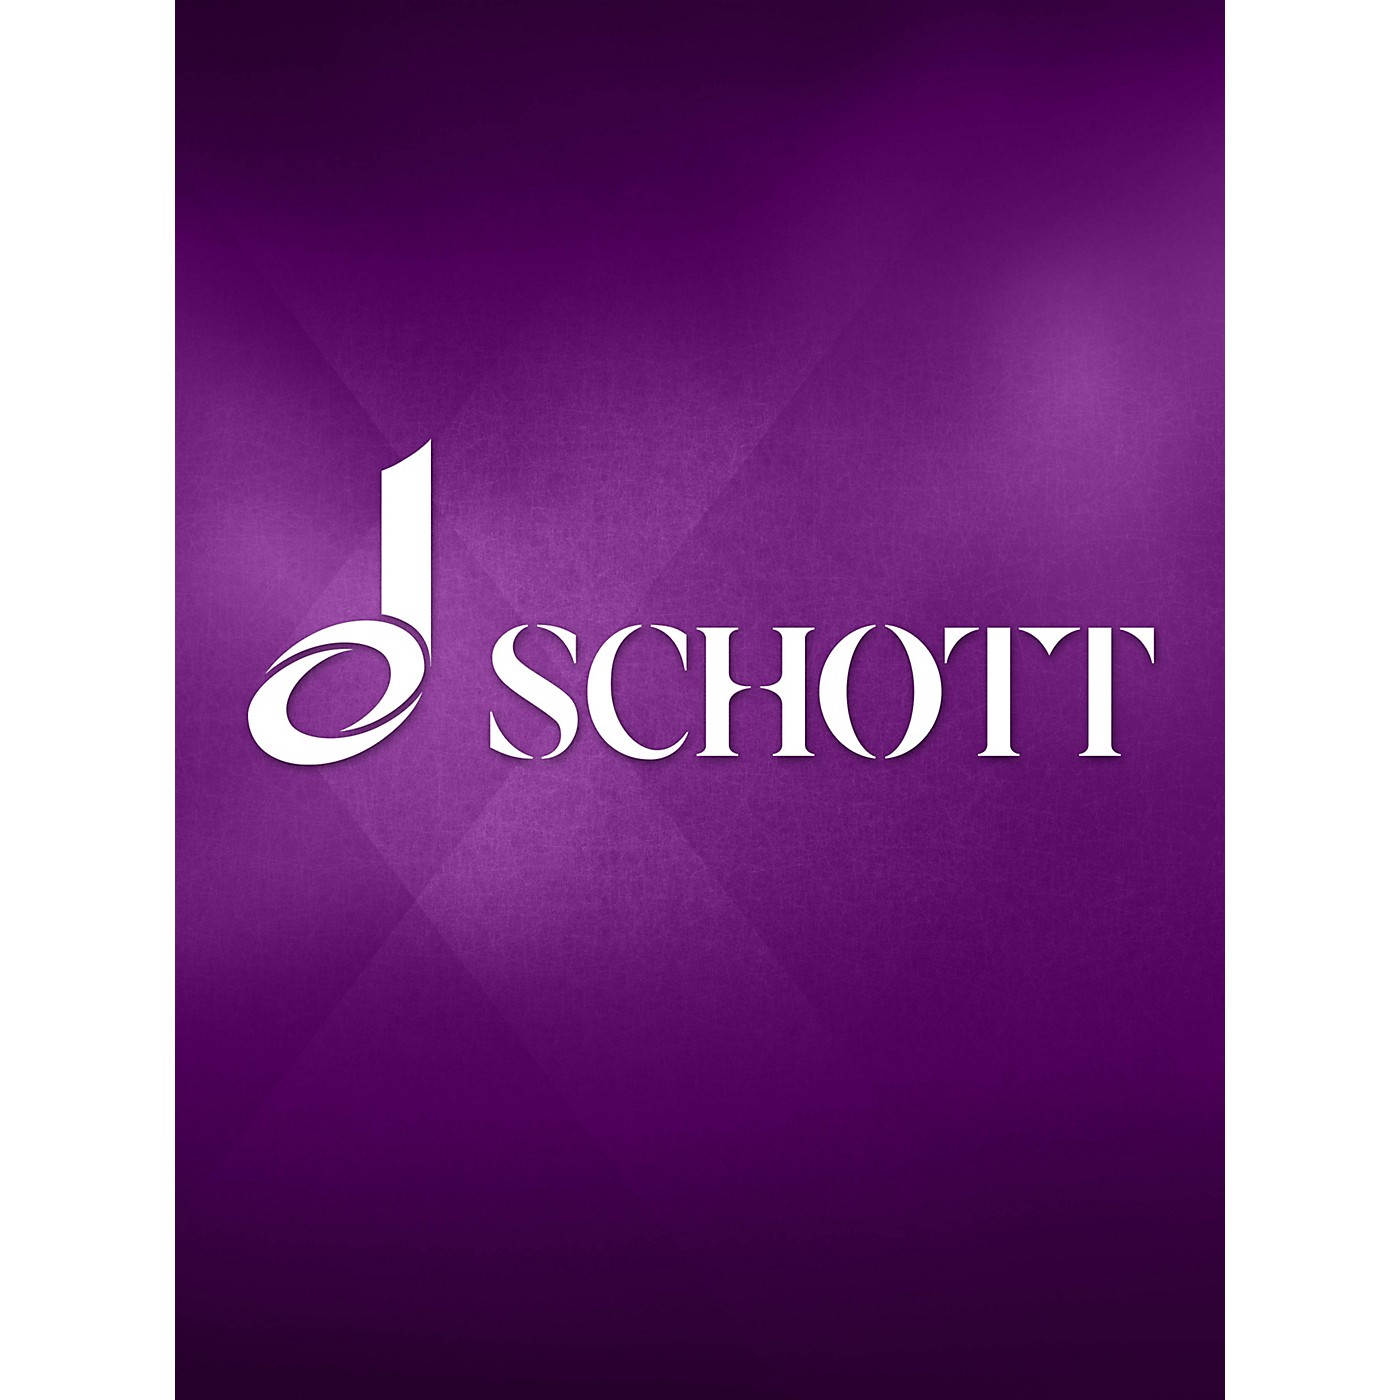 Schott Blockflötentechnik Intensiv Volume 1 (German Language) Schott Series thumbnail